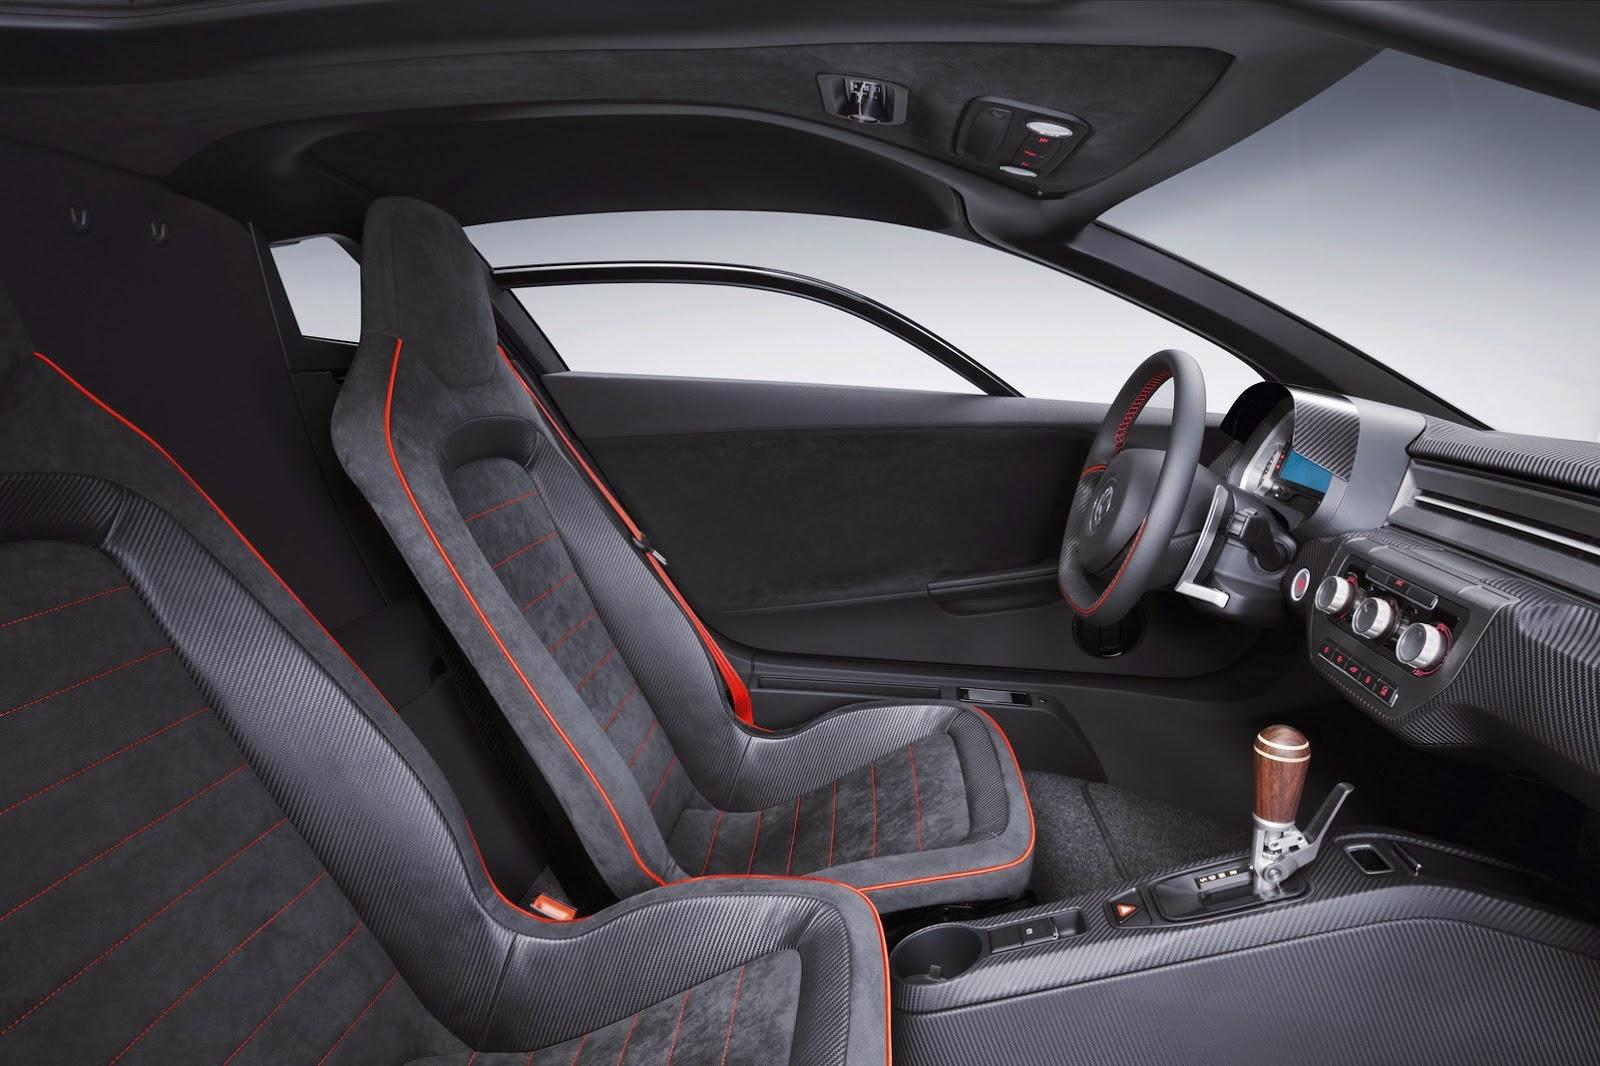 VW-XL-Sport-Study17.jpg (1600×1066)